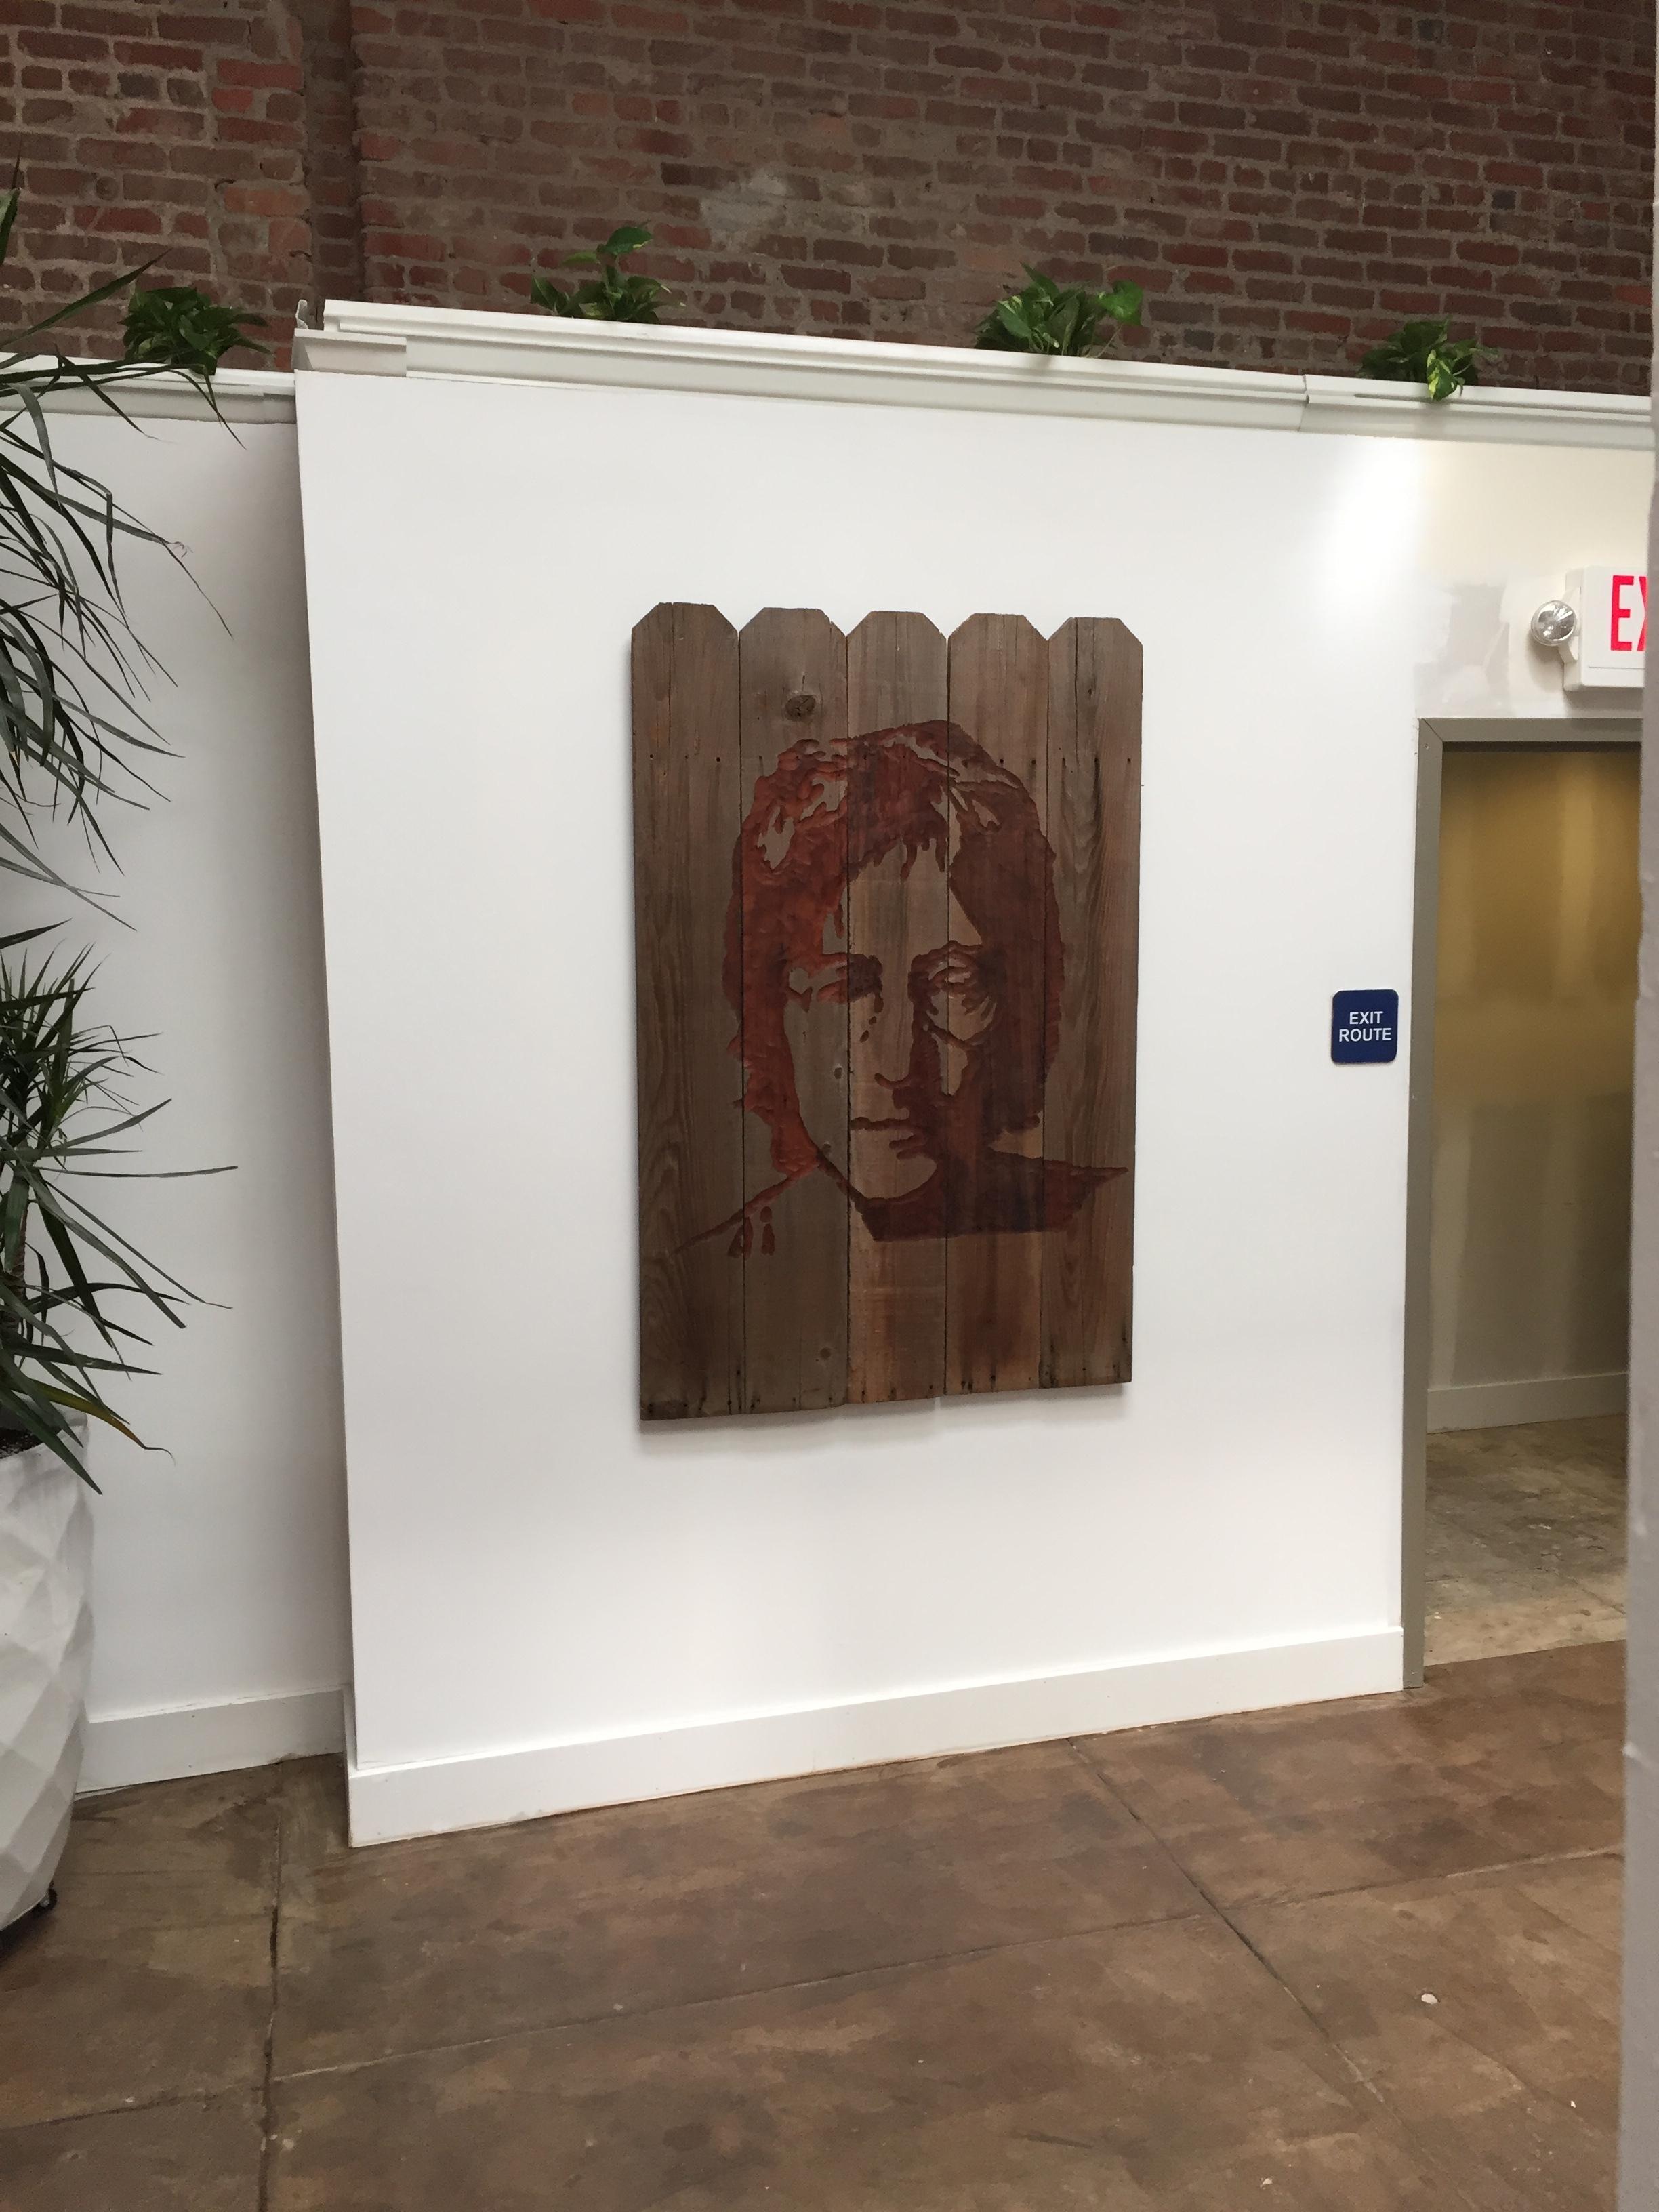 Neyborly Poet's Corner Berkeley: Reclaimed Wood - 60 x 40 x 2